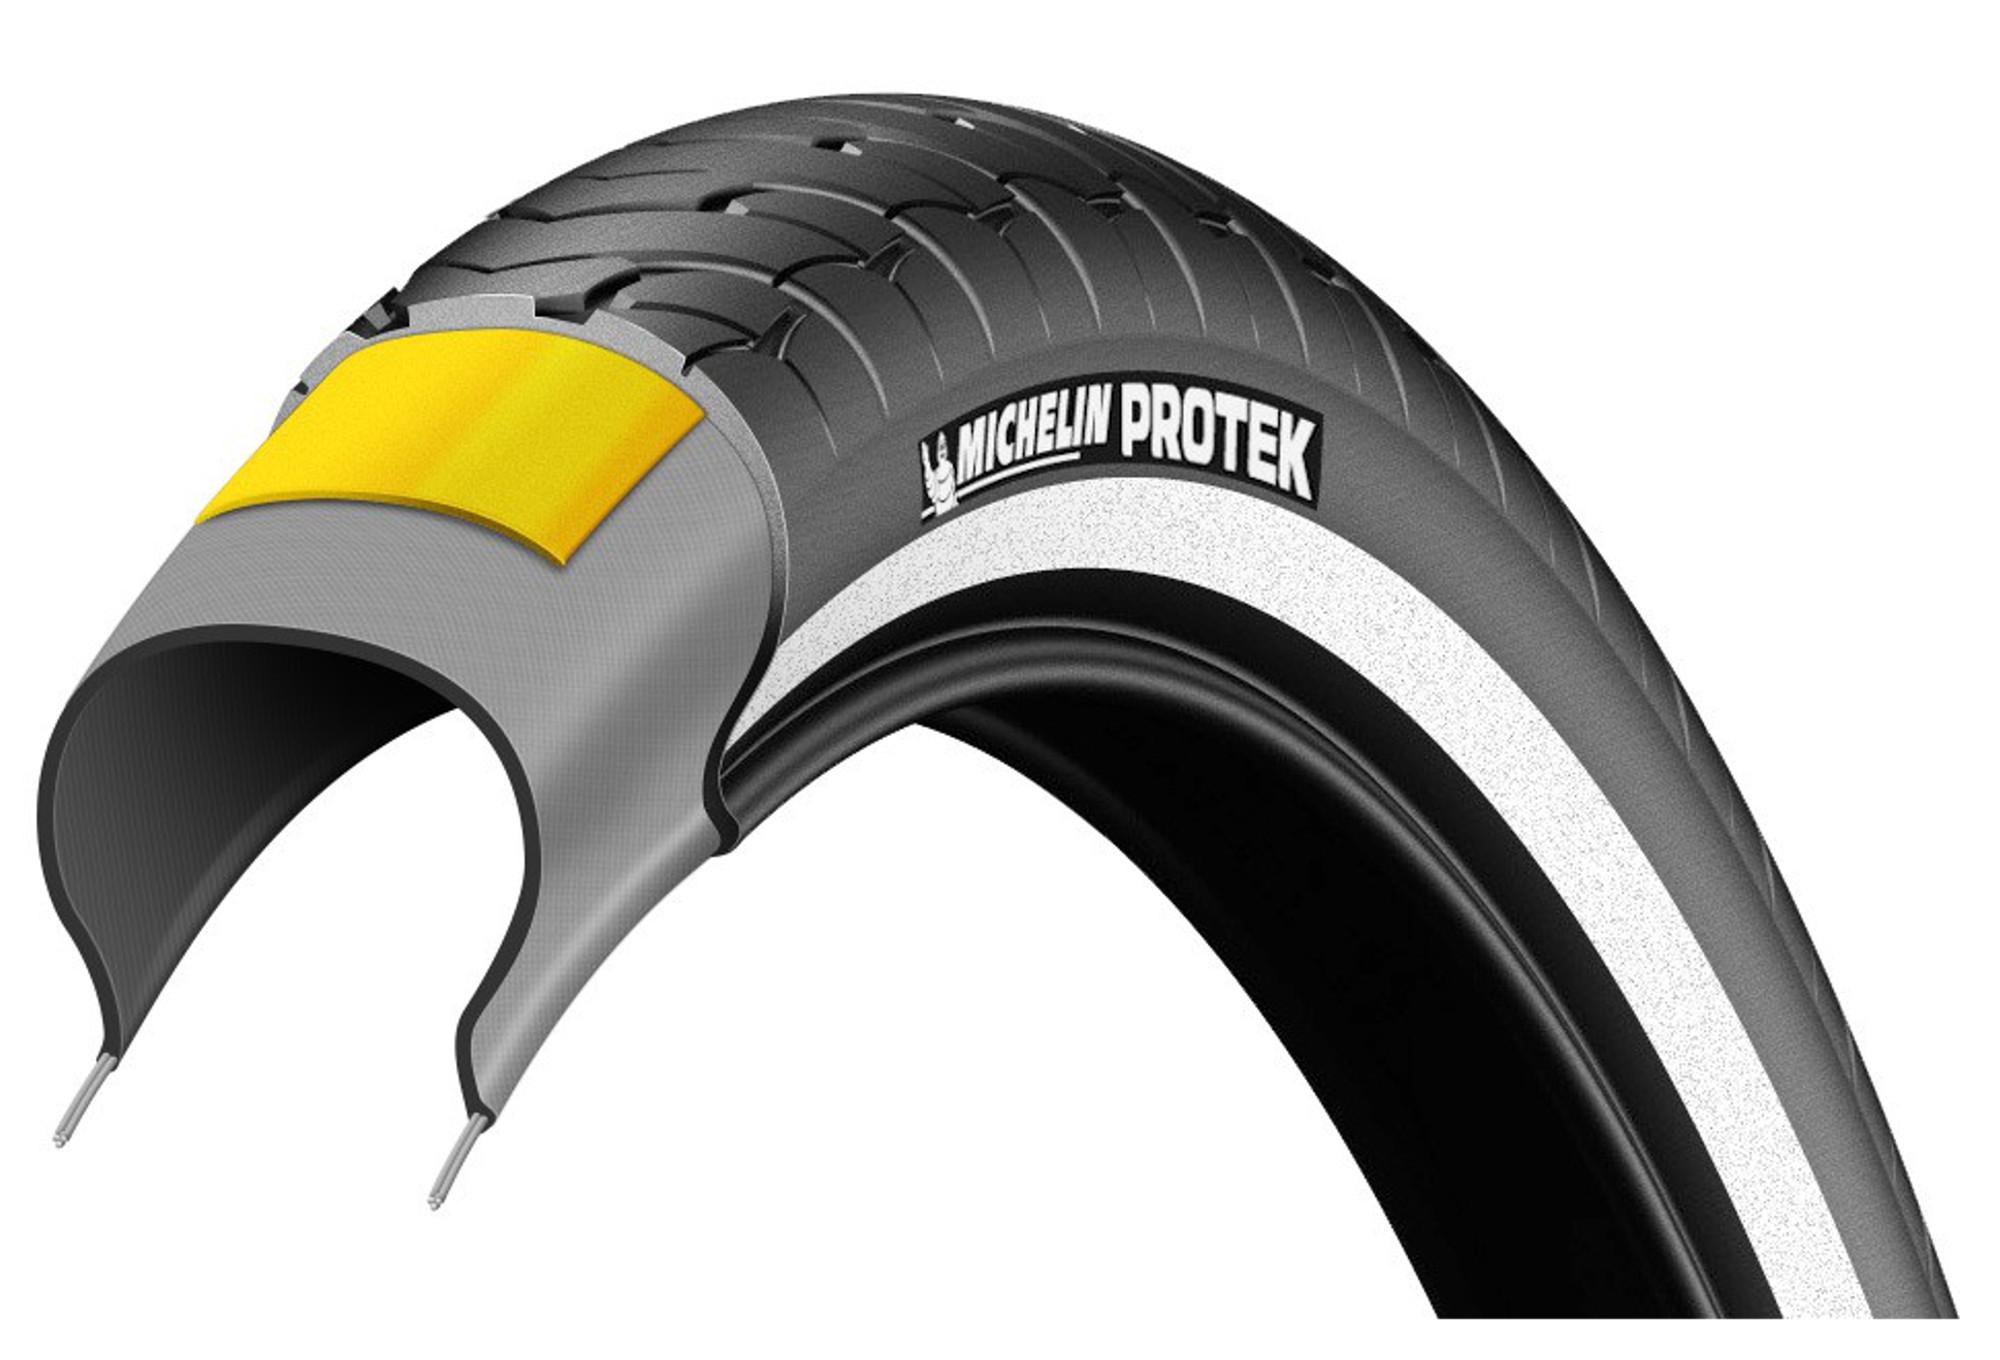 Pneu urbain Michelin Protek 700 renfort anti crevaison